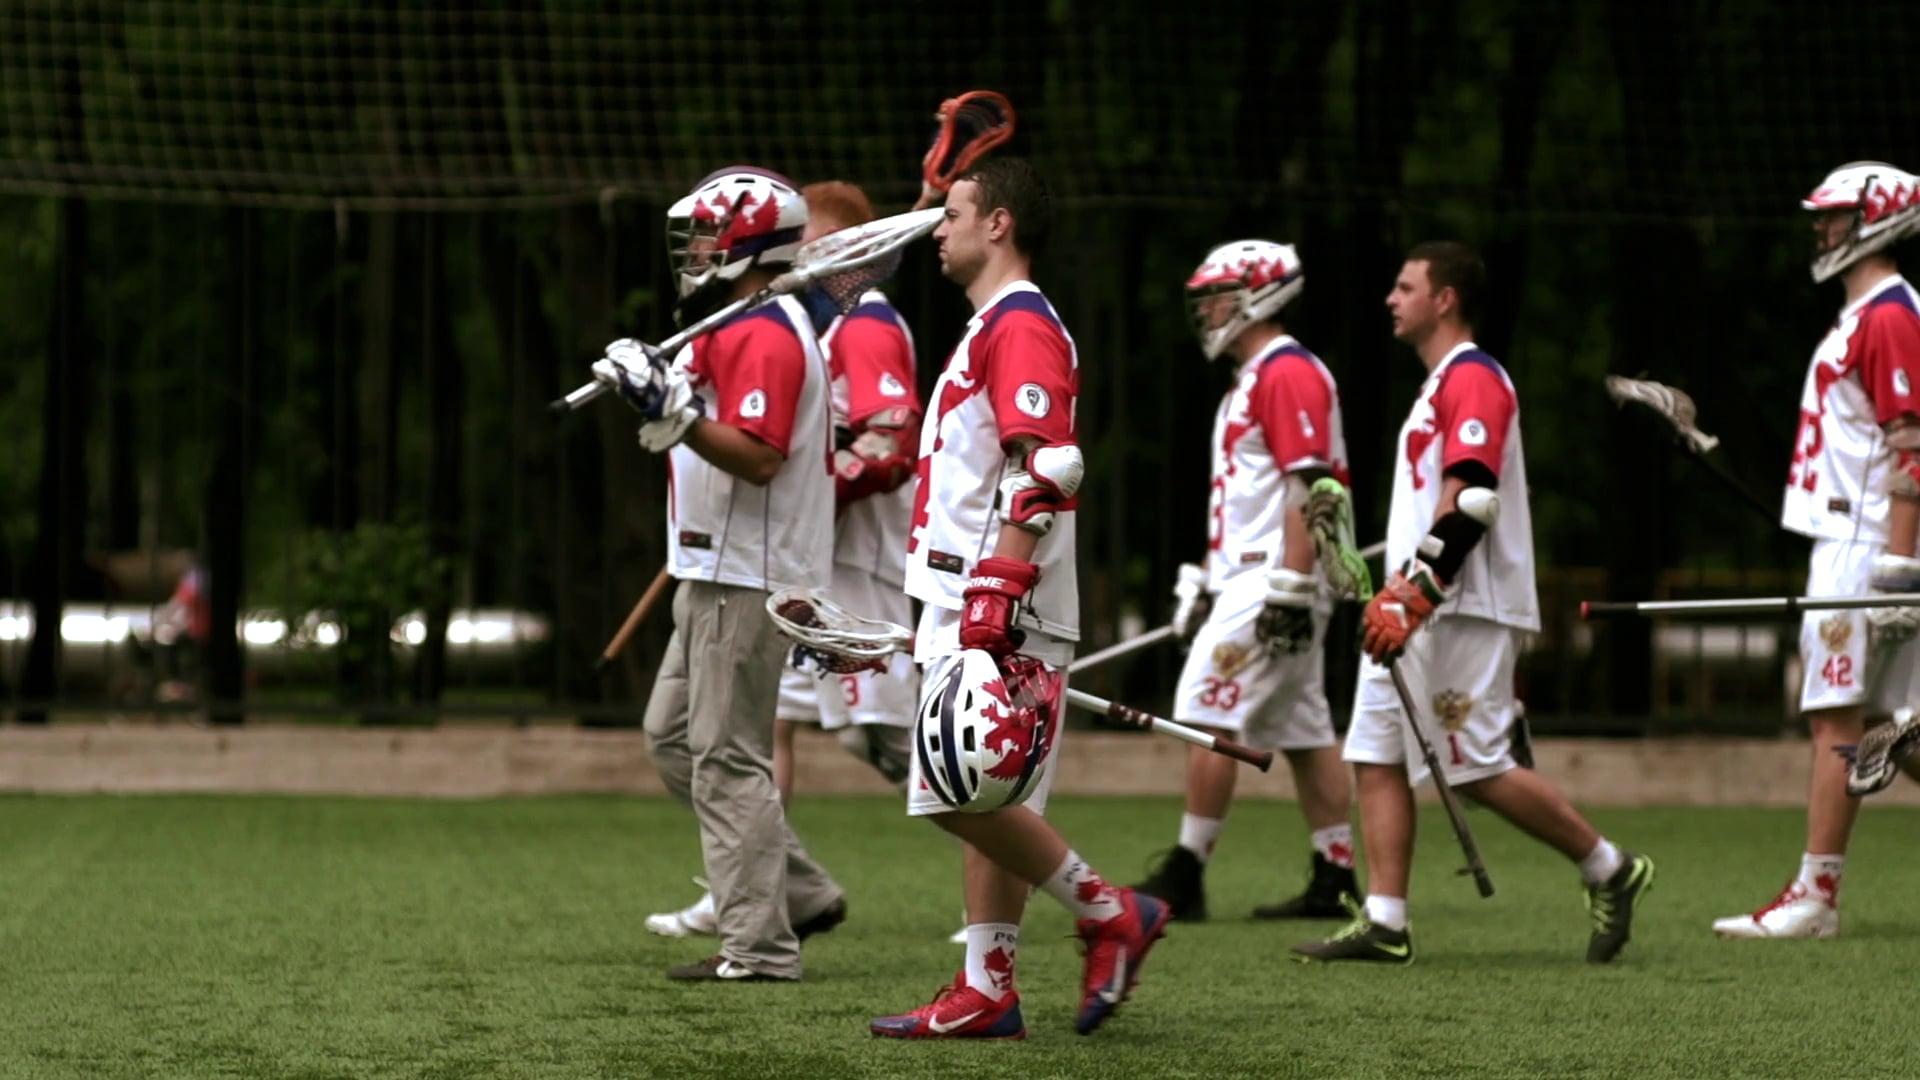 Lacrosse Promo